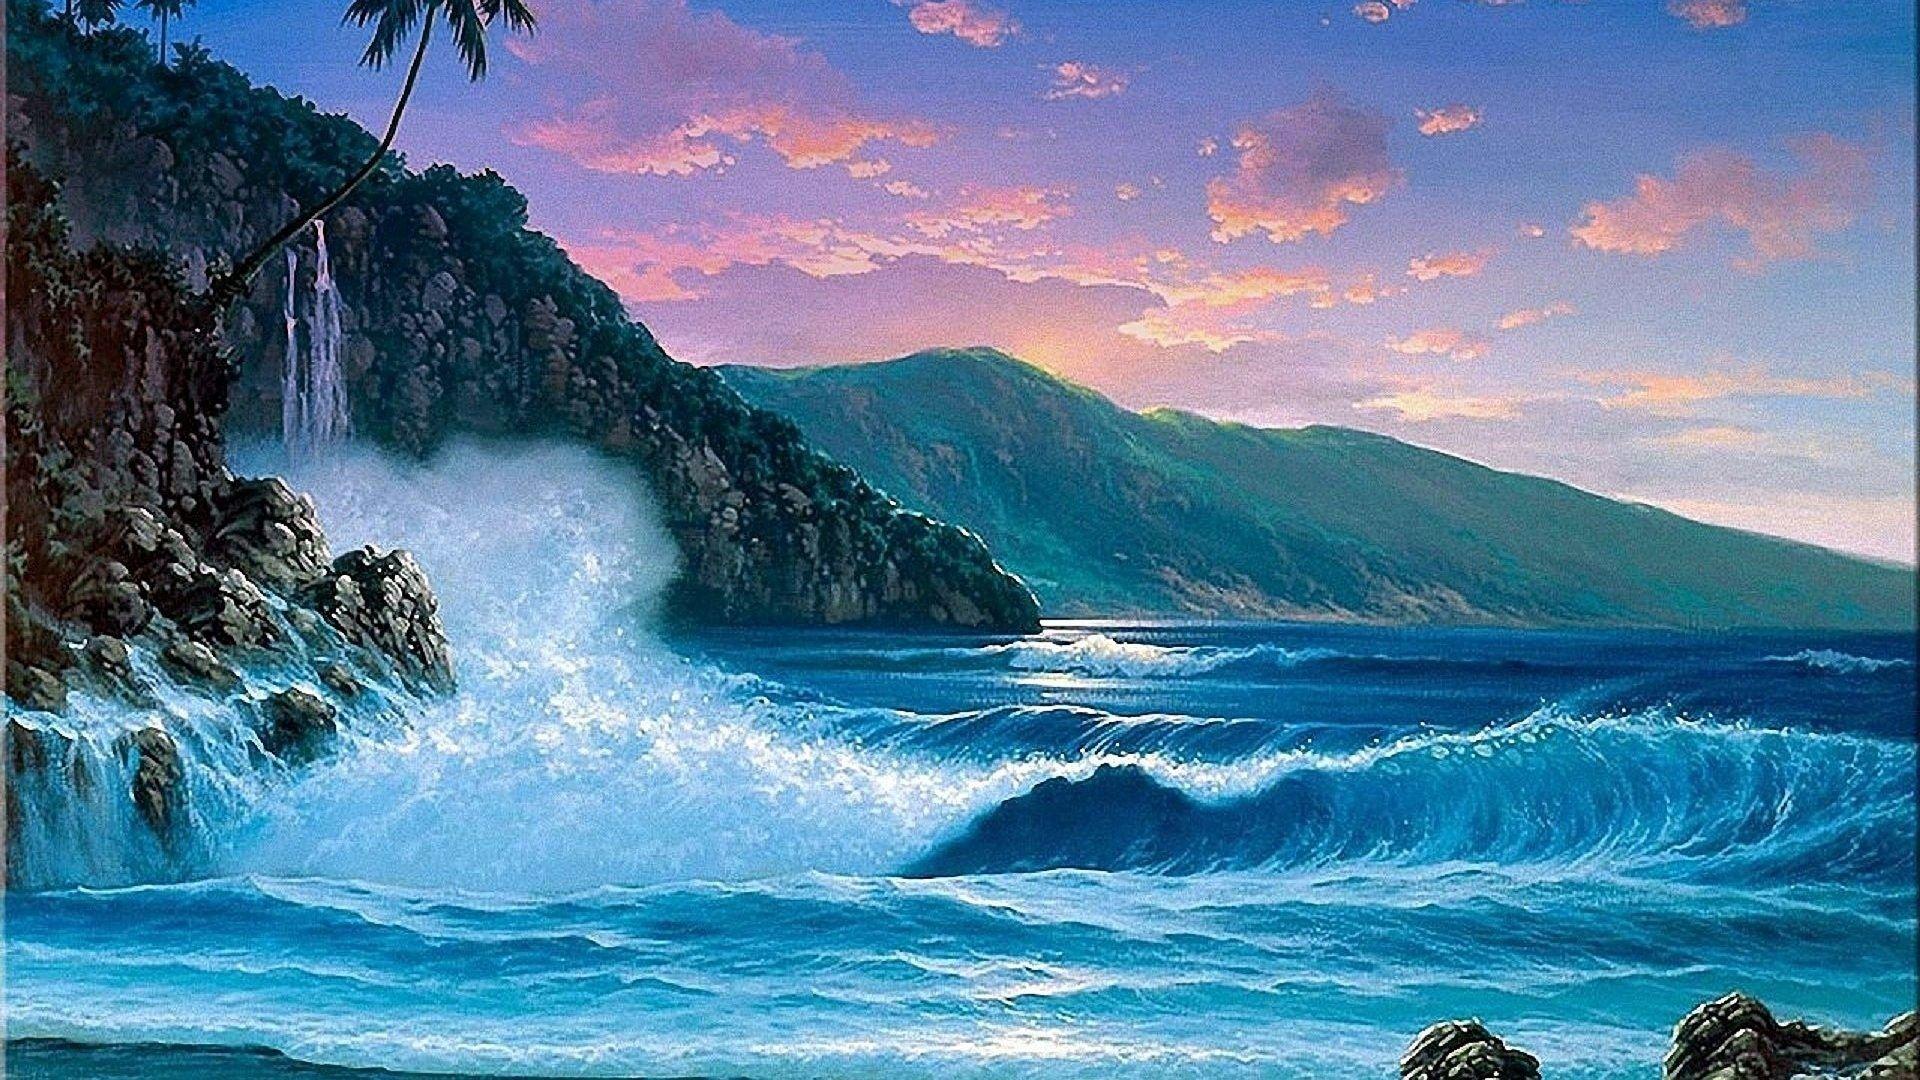 Ocean Wallpapers Wallpapers   All Superior Ocean Wallpapers 1920x1080